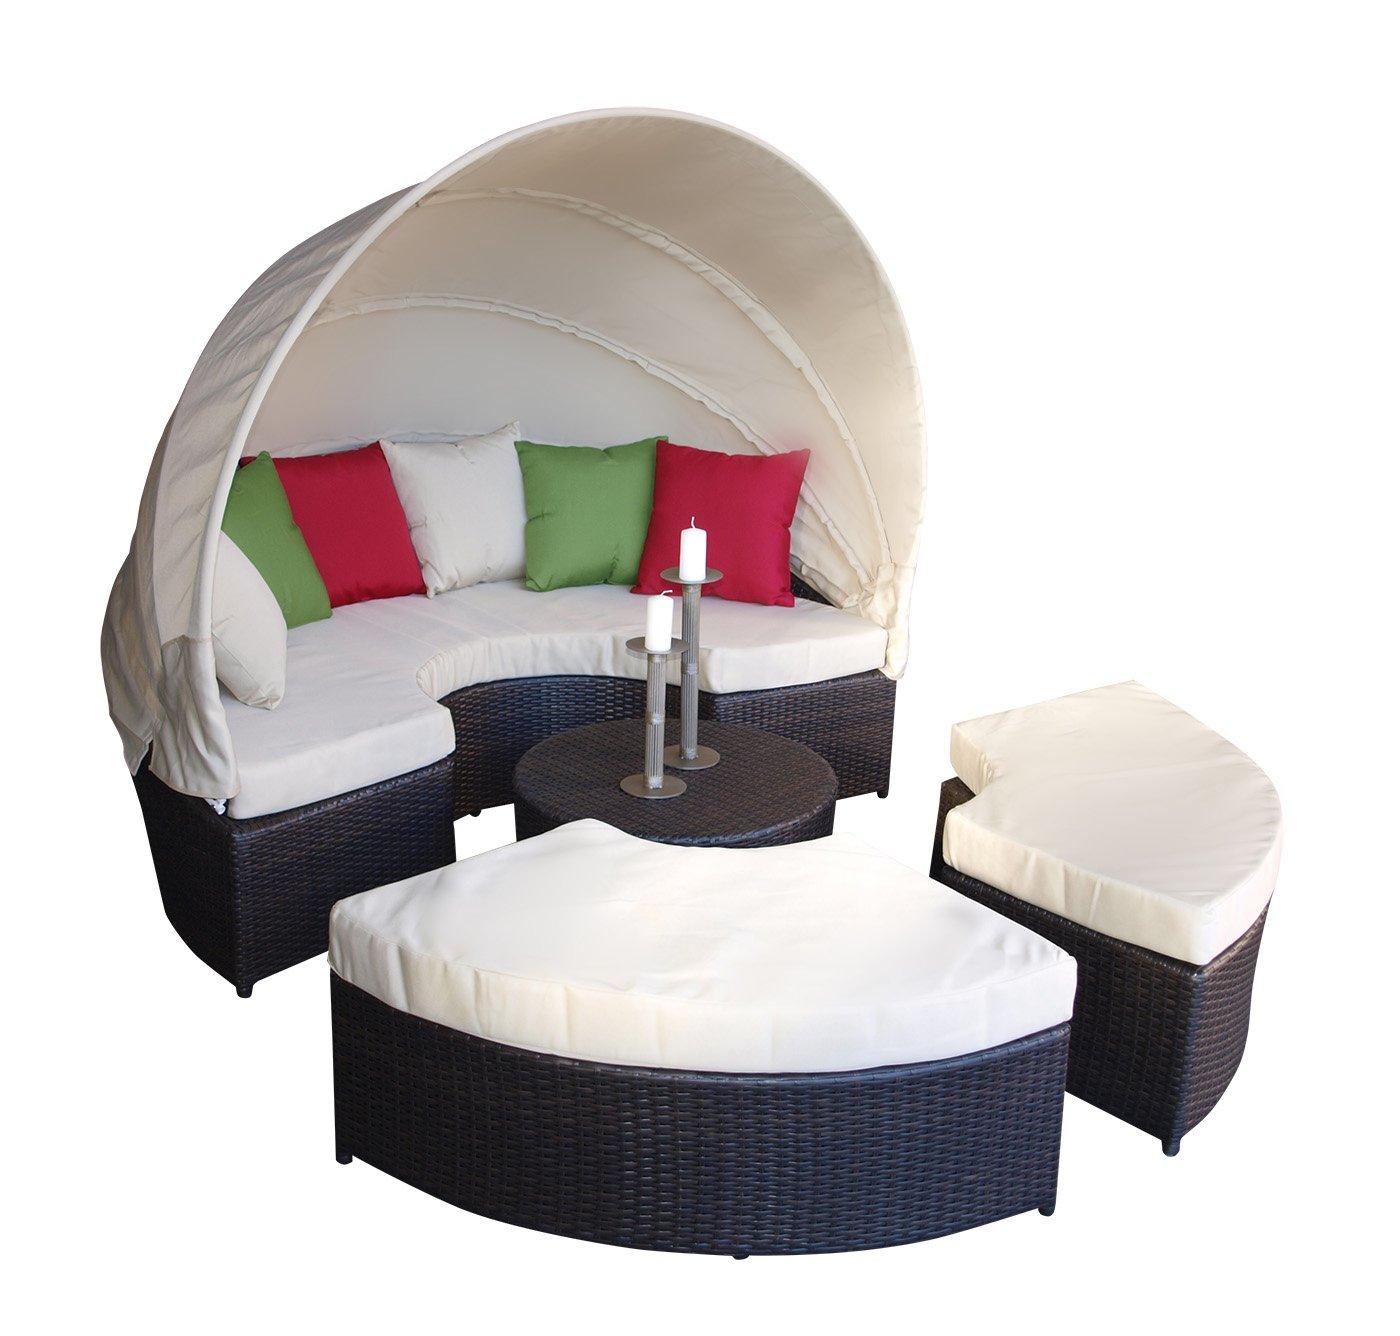 Liegeinsel ALCUDIA aus Alu + Polyrattan dunkelbraun, Polster ecru, nutzbar als Lounge Garnitur, fertig montiert